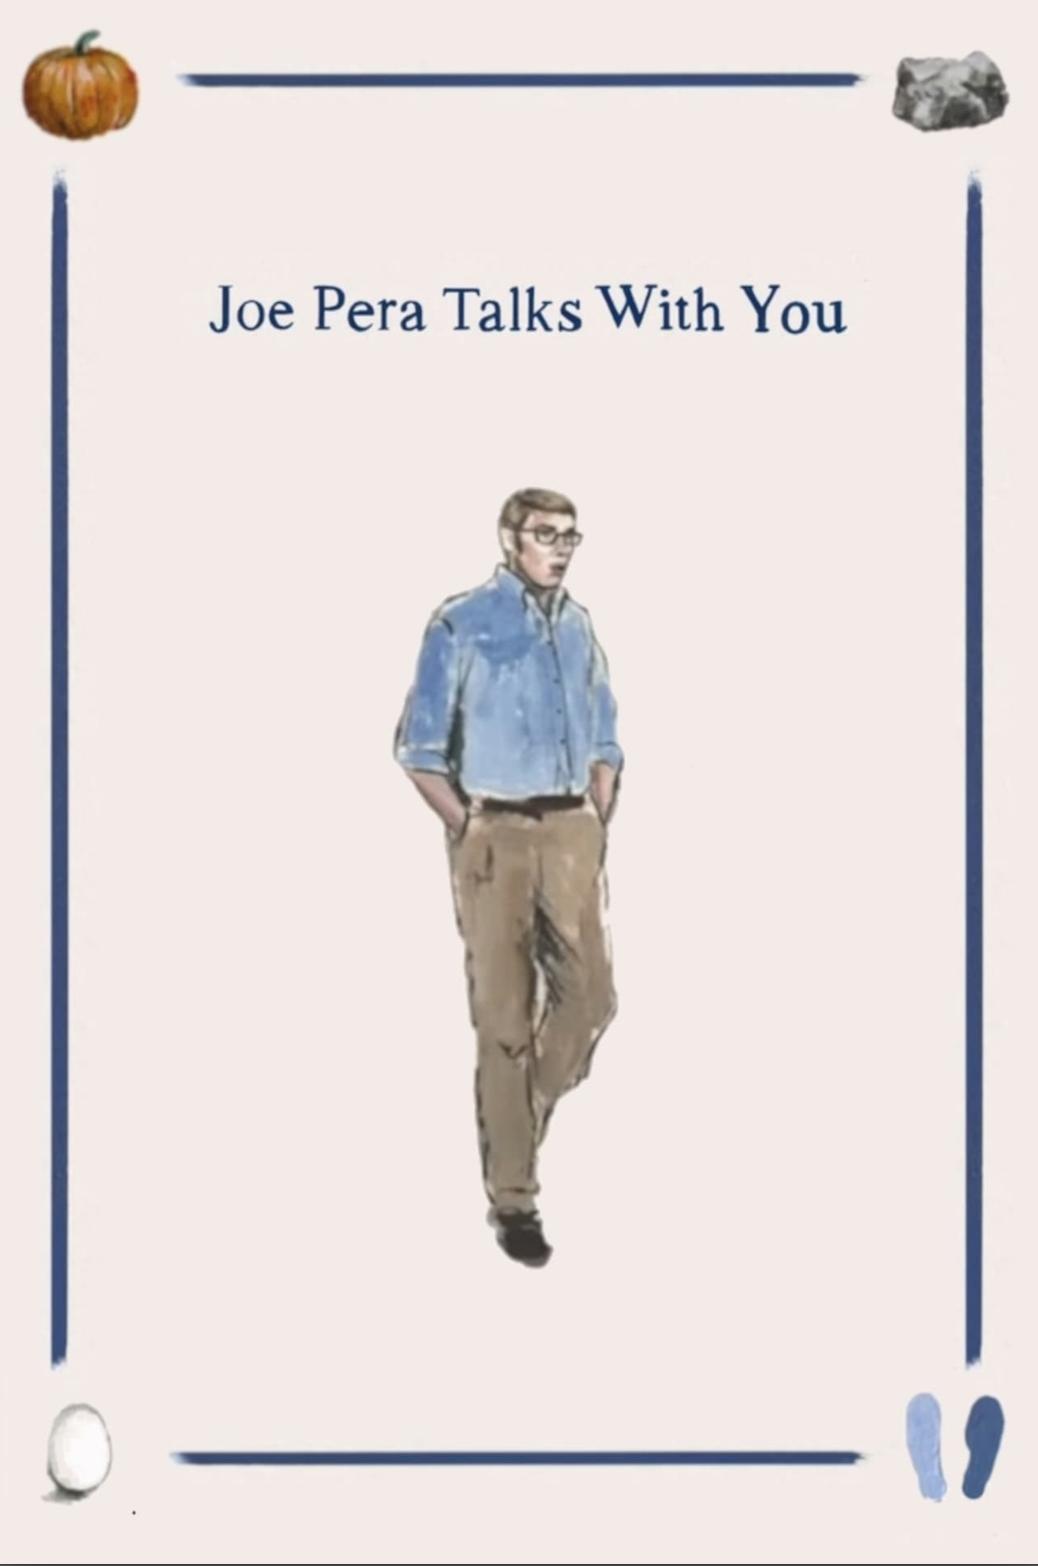 Joe Pera Talks with You (TV Series 2018– ) - IMDb